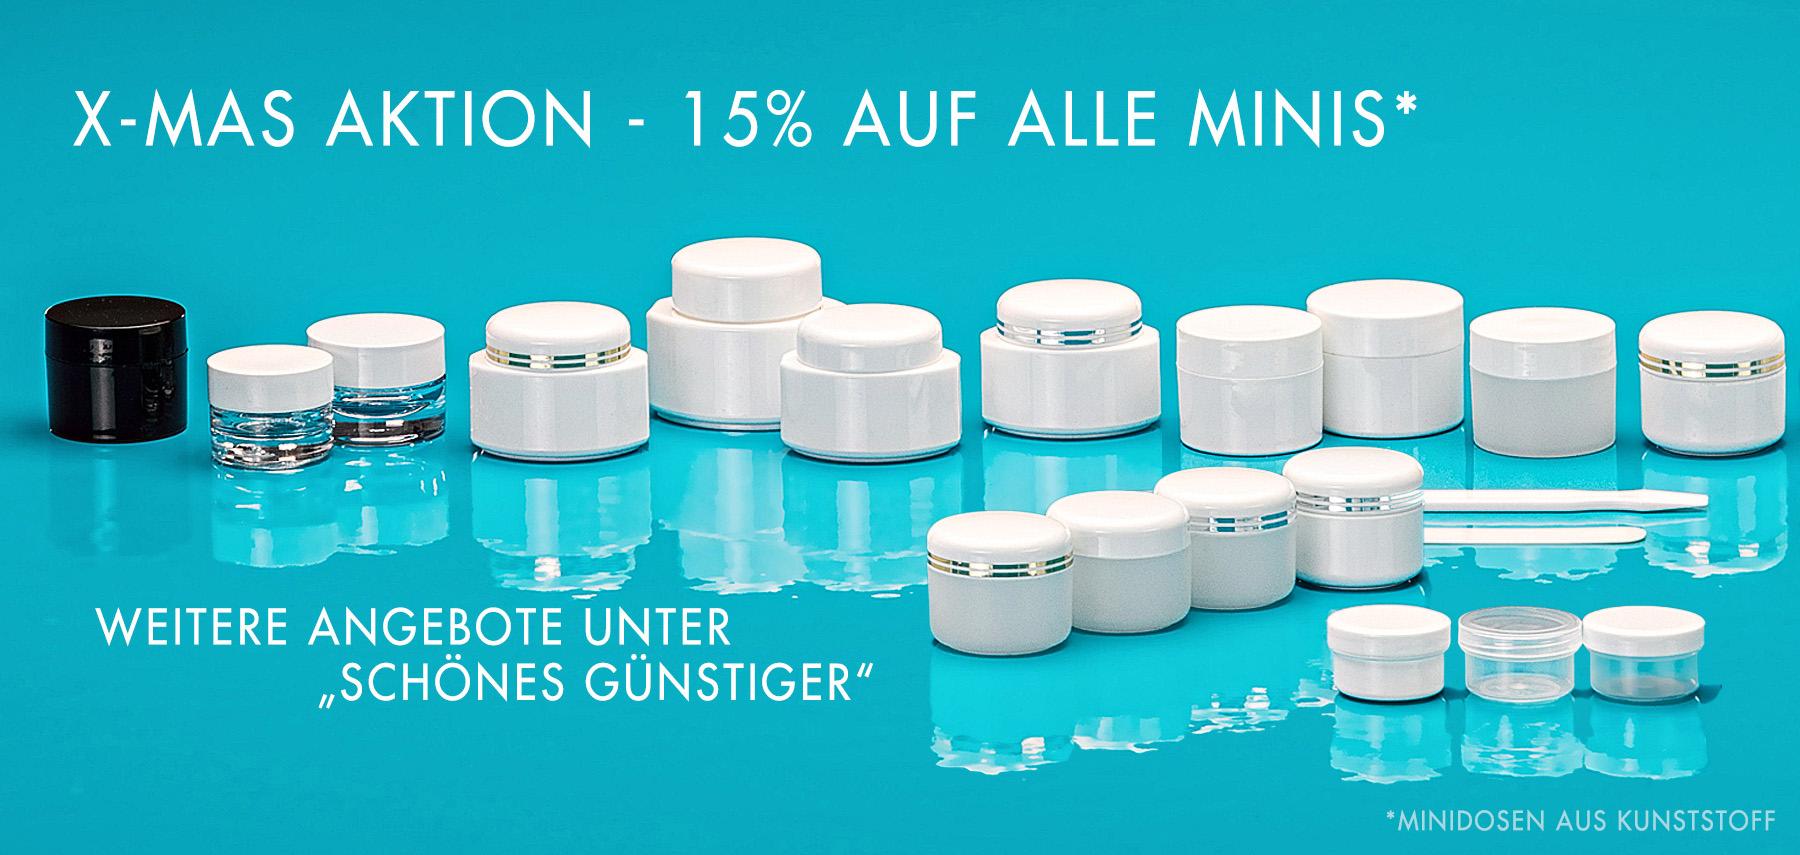 X-MAS Aktion - 15% auf alle Minis (Minidosen aus Kunststoff)